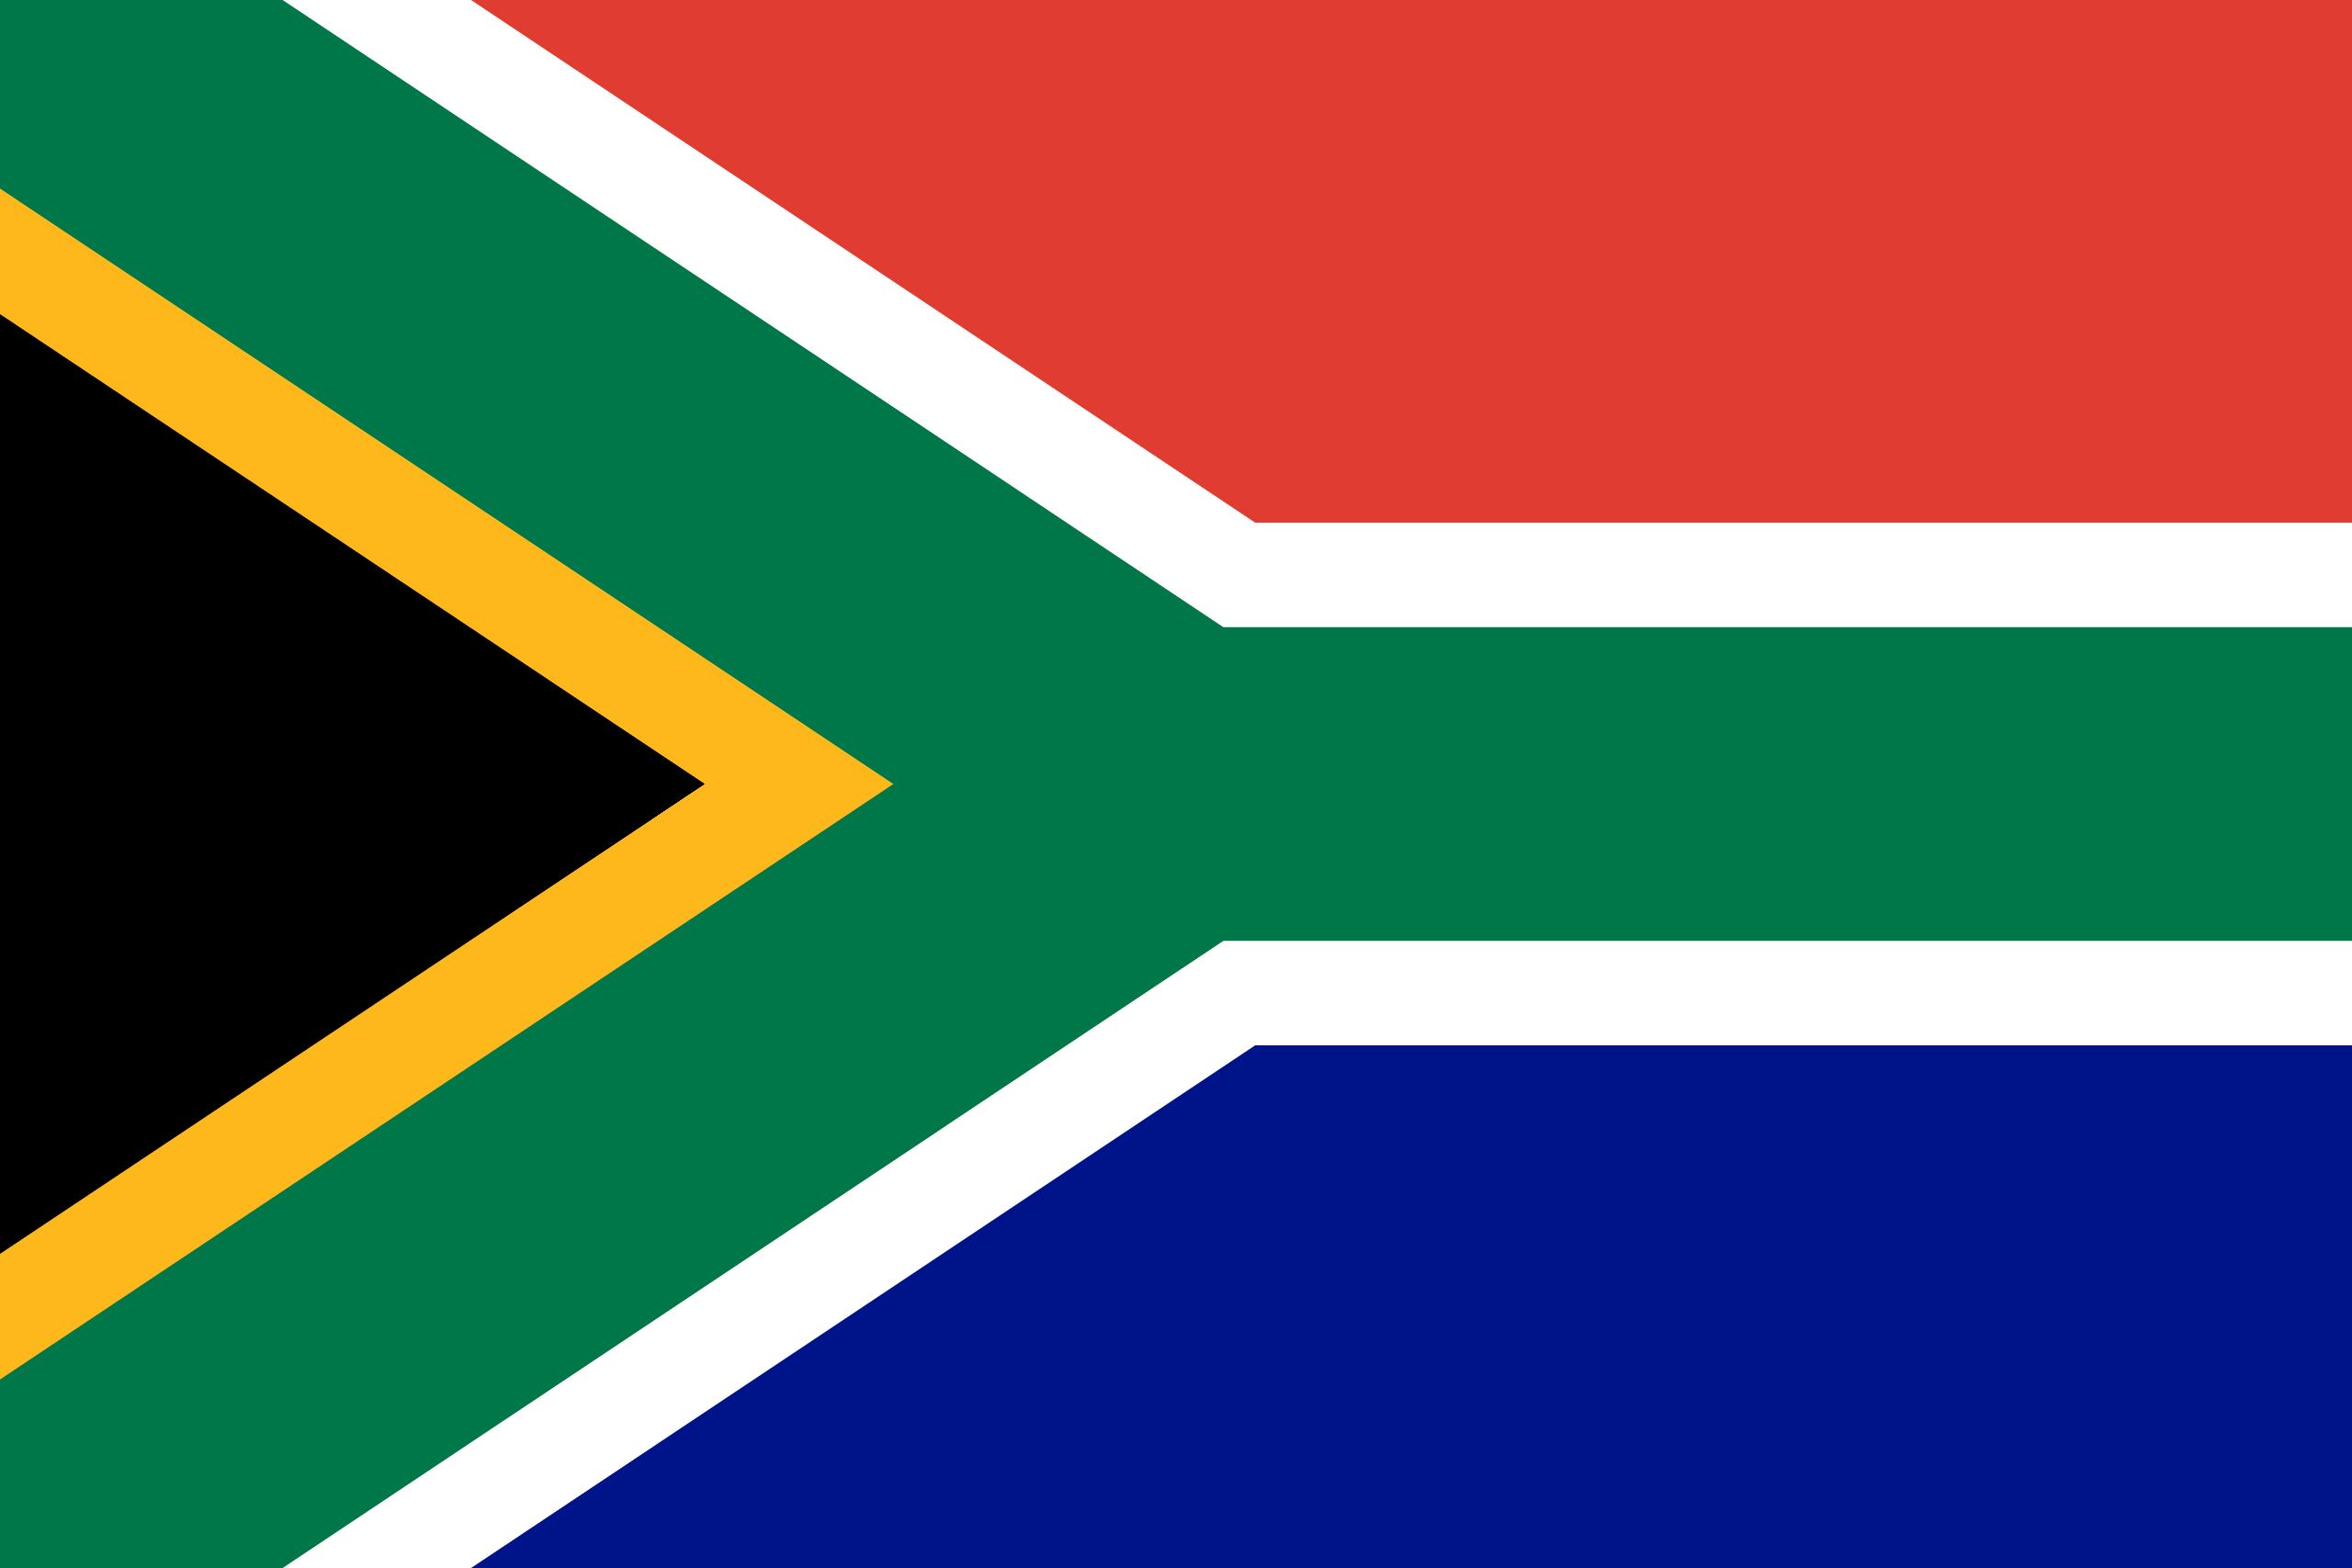 Illustration of South Africa flag